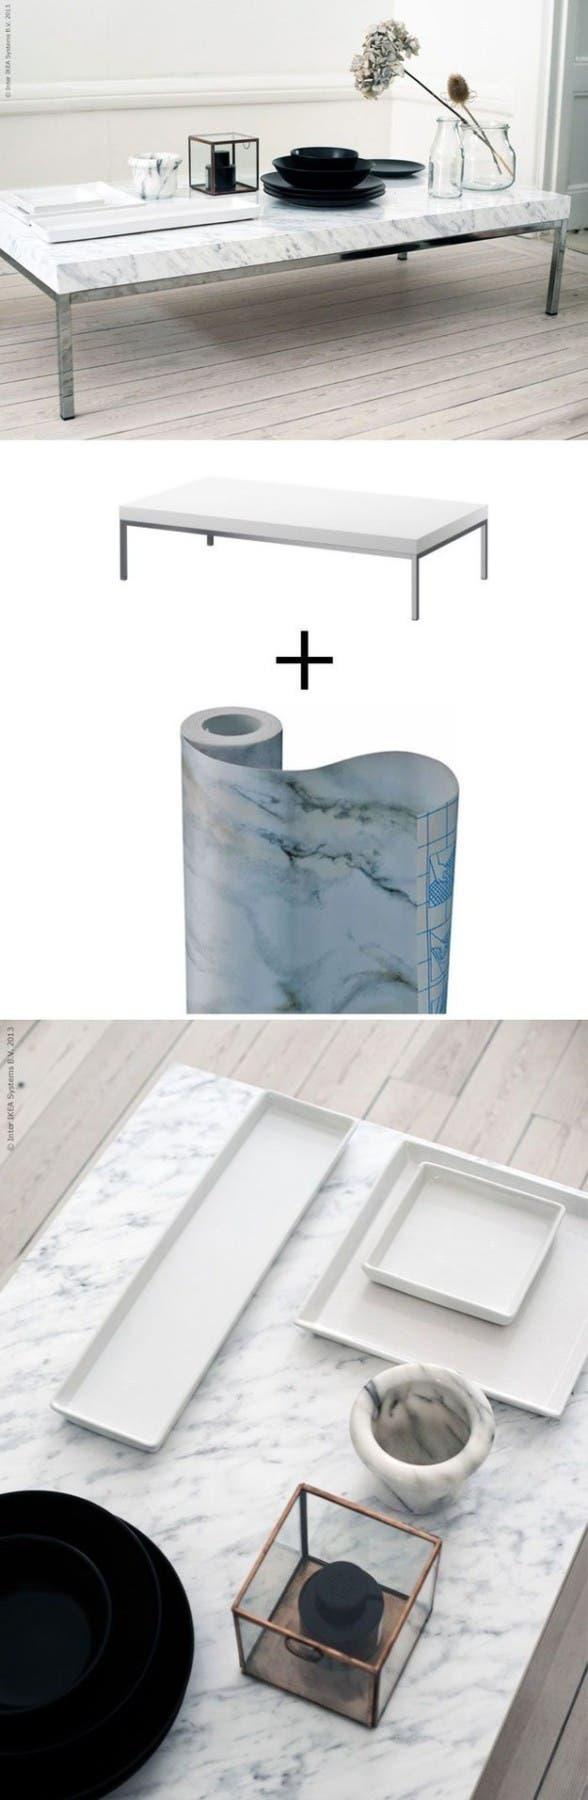 restauracion-muebles-14